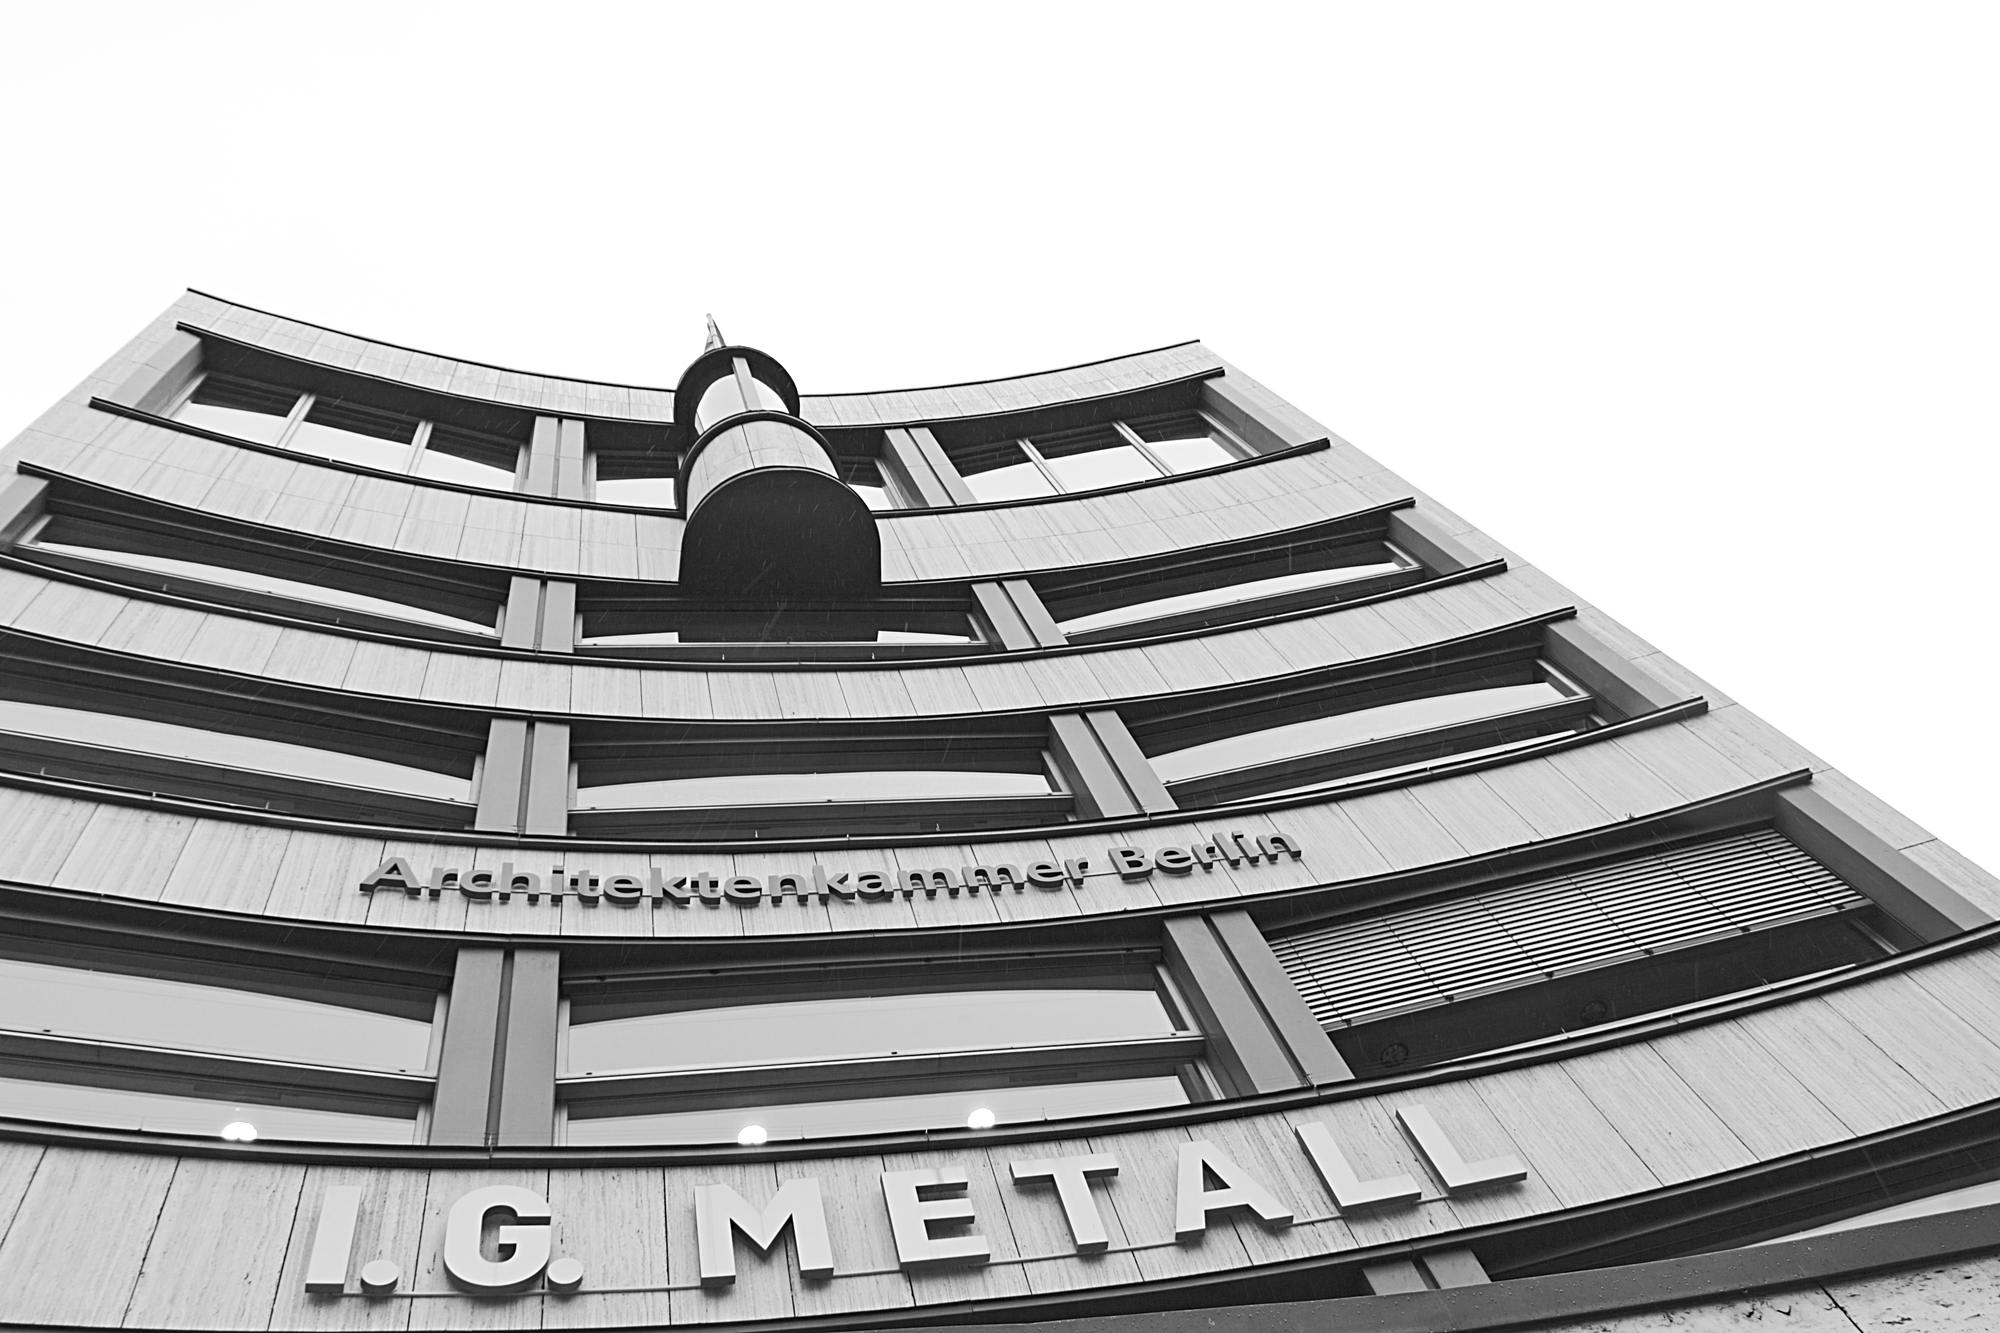 I G Metall building in Berlin